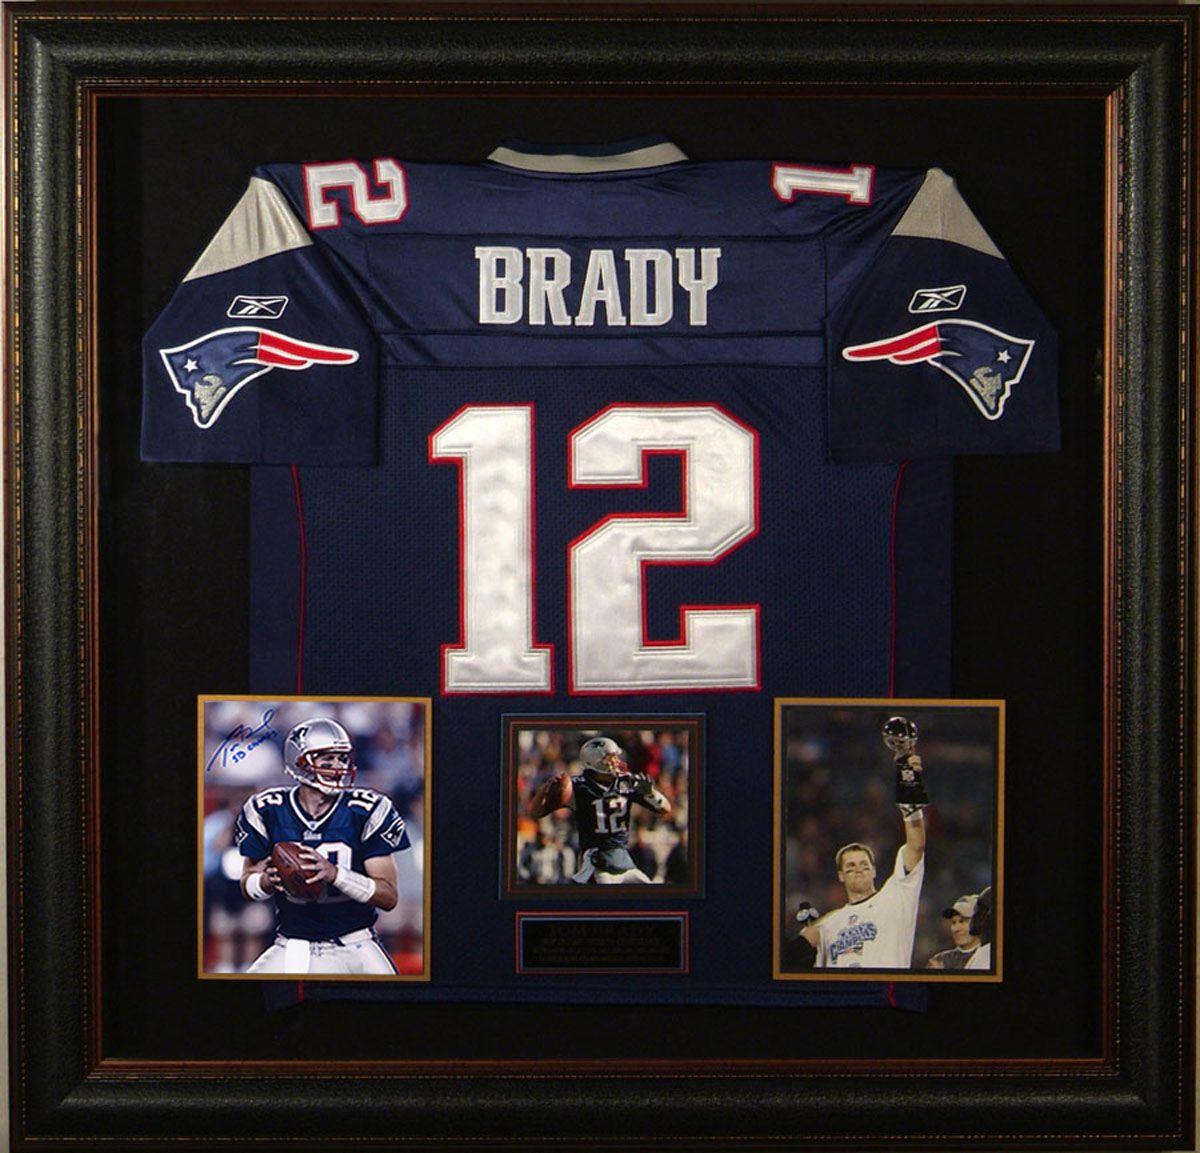 Tom Brady Autographed Patriots Photo with Framed Jersey | Jersey ...